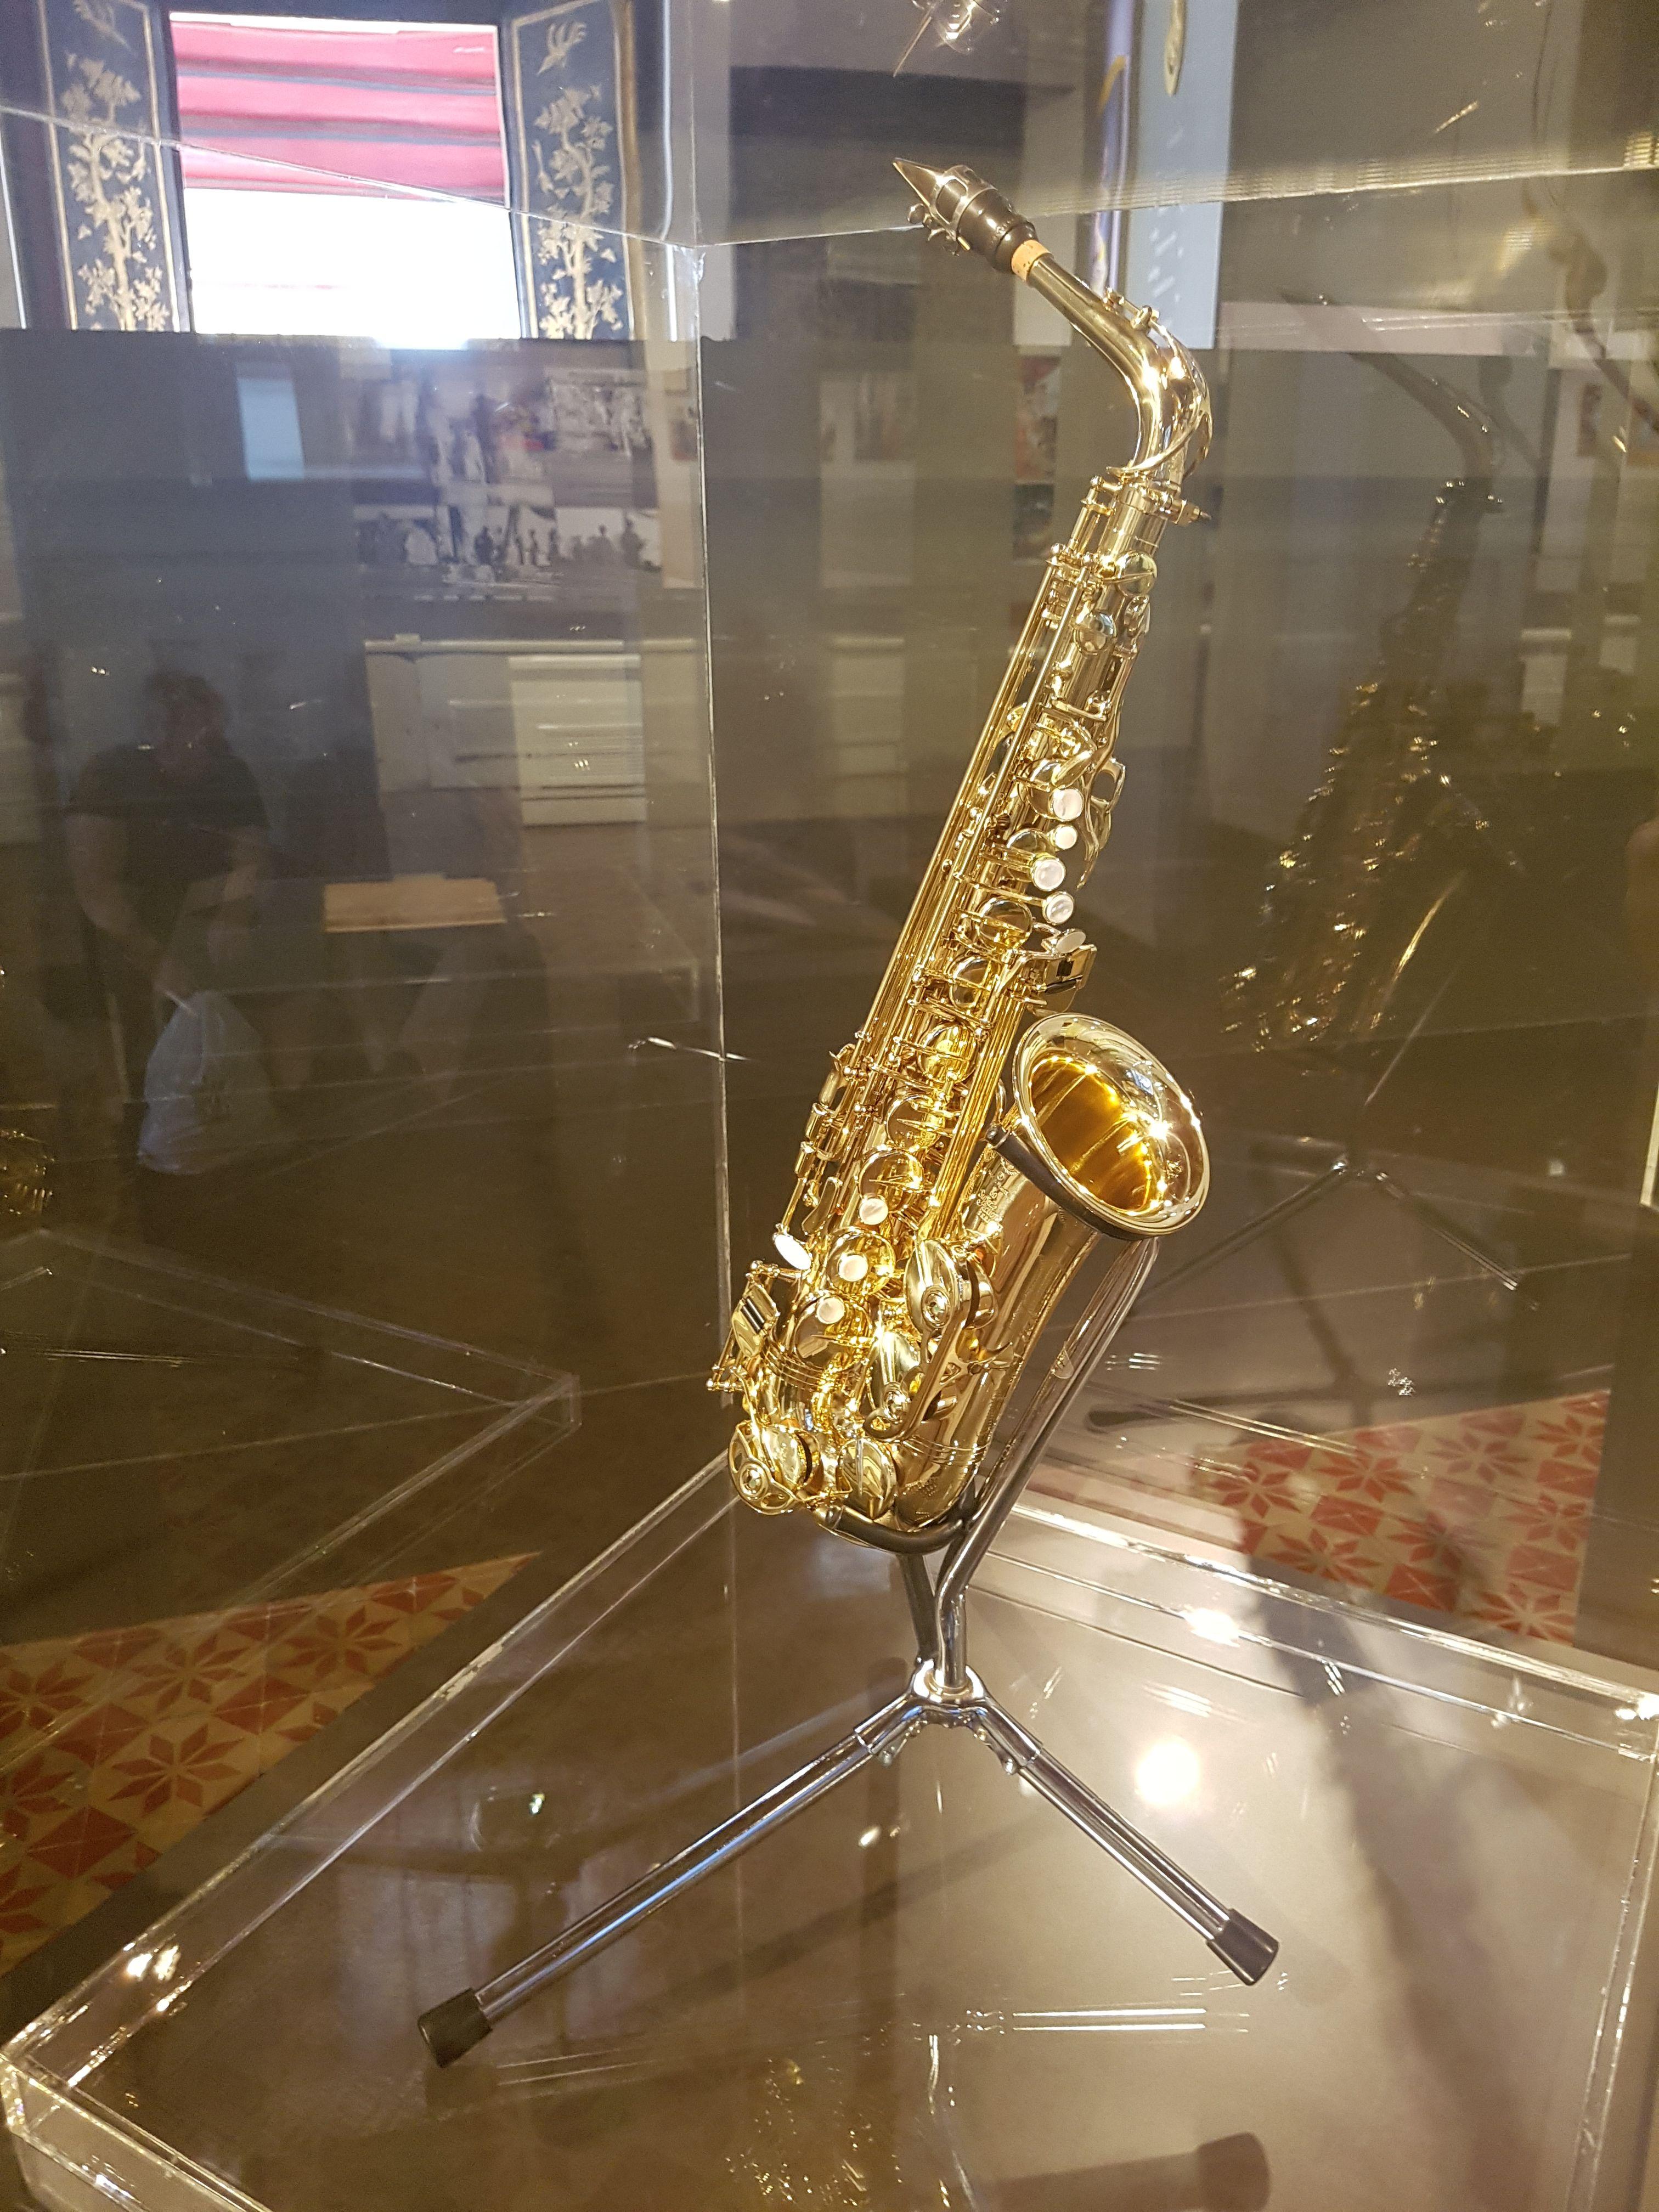 King Bhumibol's saxophone as seen at Itsara Winitchai Hall in the Bangkok National Museum, Bangkok. Photo taken on June 11, 2017